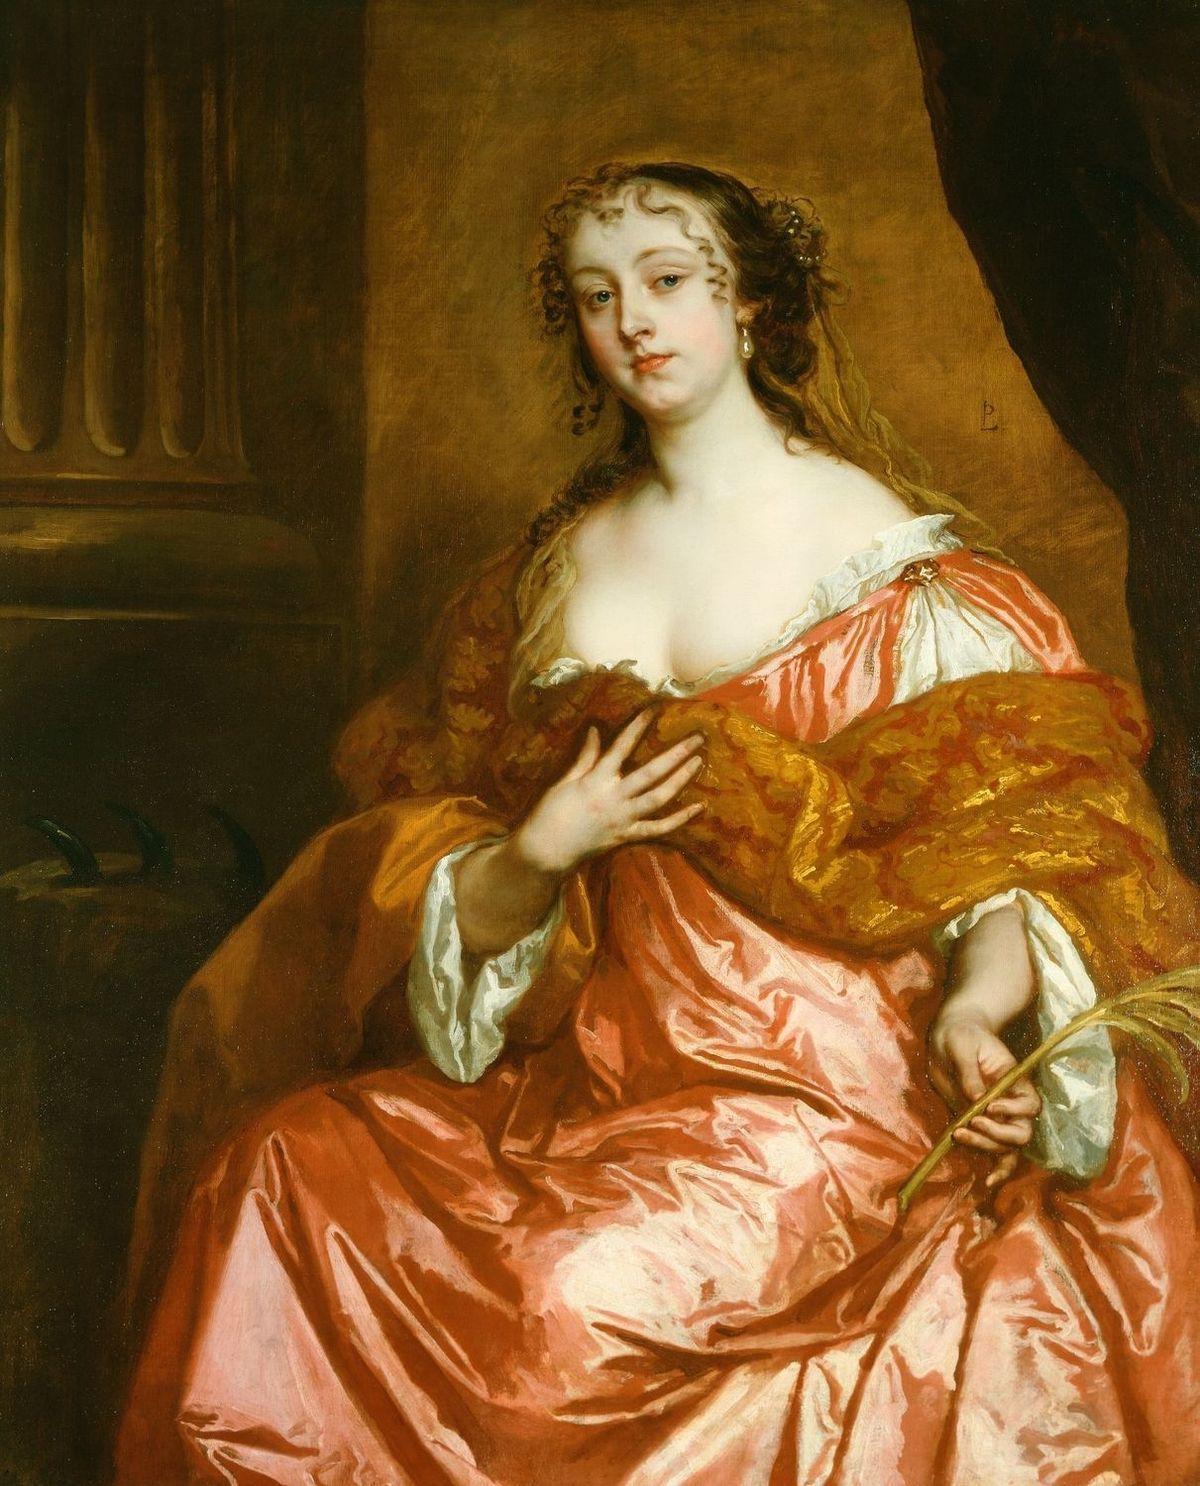 http://upload.wikimedia.org/wikipedia/commons/thumb/d/d1/Lely_(1670)_-_Elizabeth_Hamilton_(1640-1708).jpg/1200px-Lely_(1670)_-_Elizabeth_Hamilton_(1640-1708).jpg